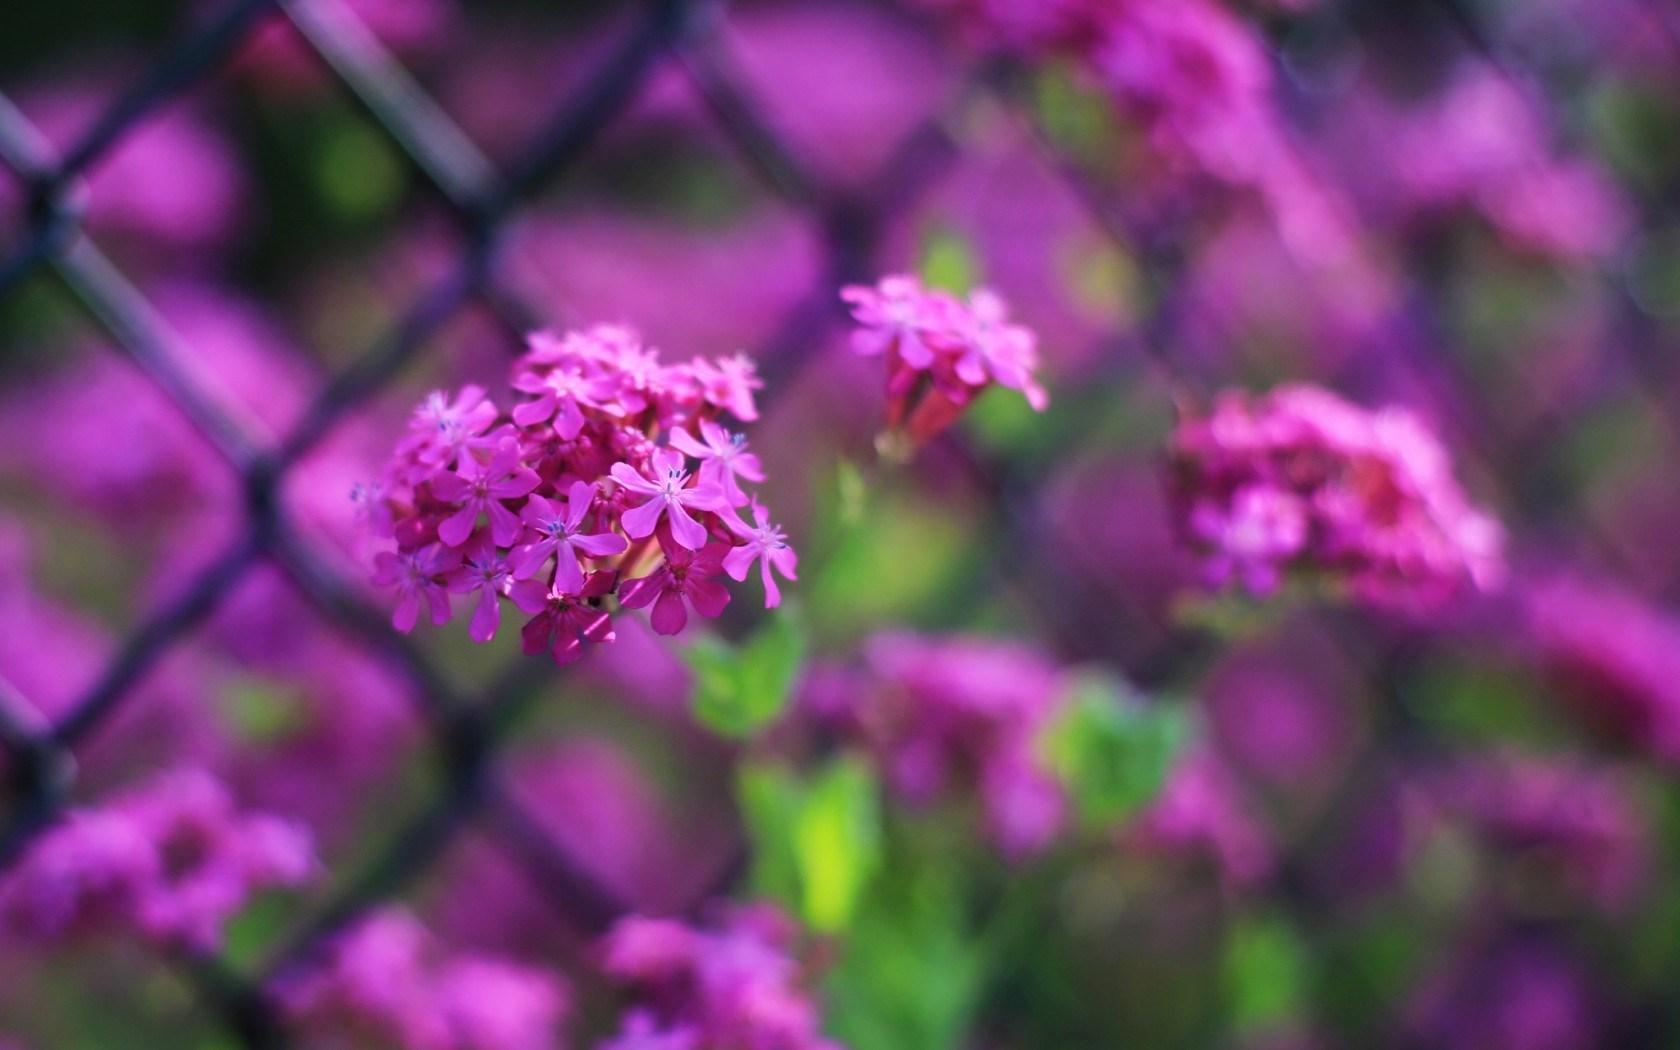 flowers focus fence